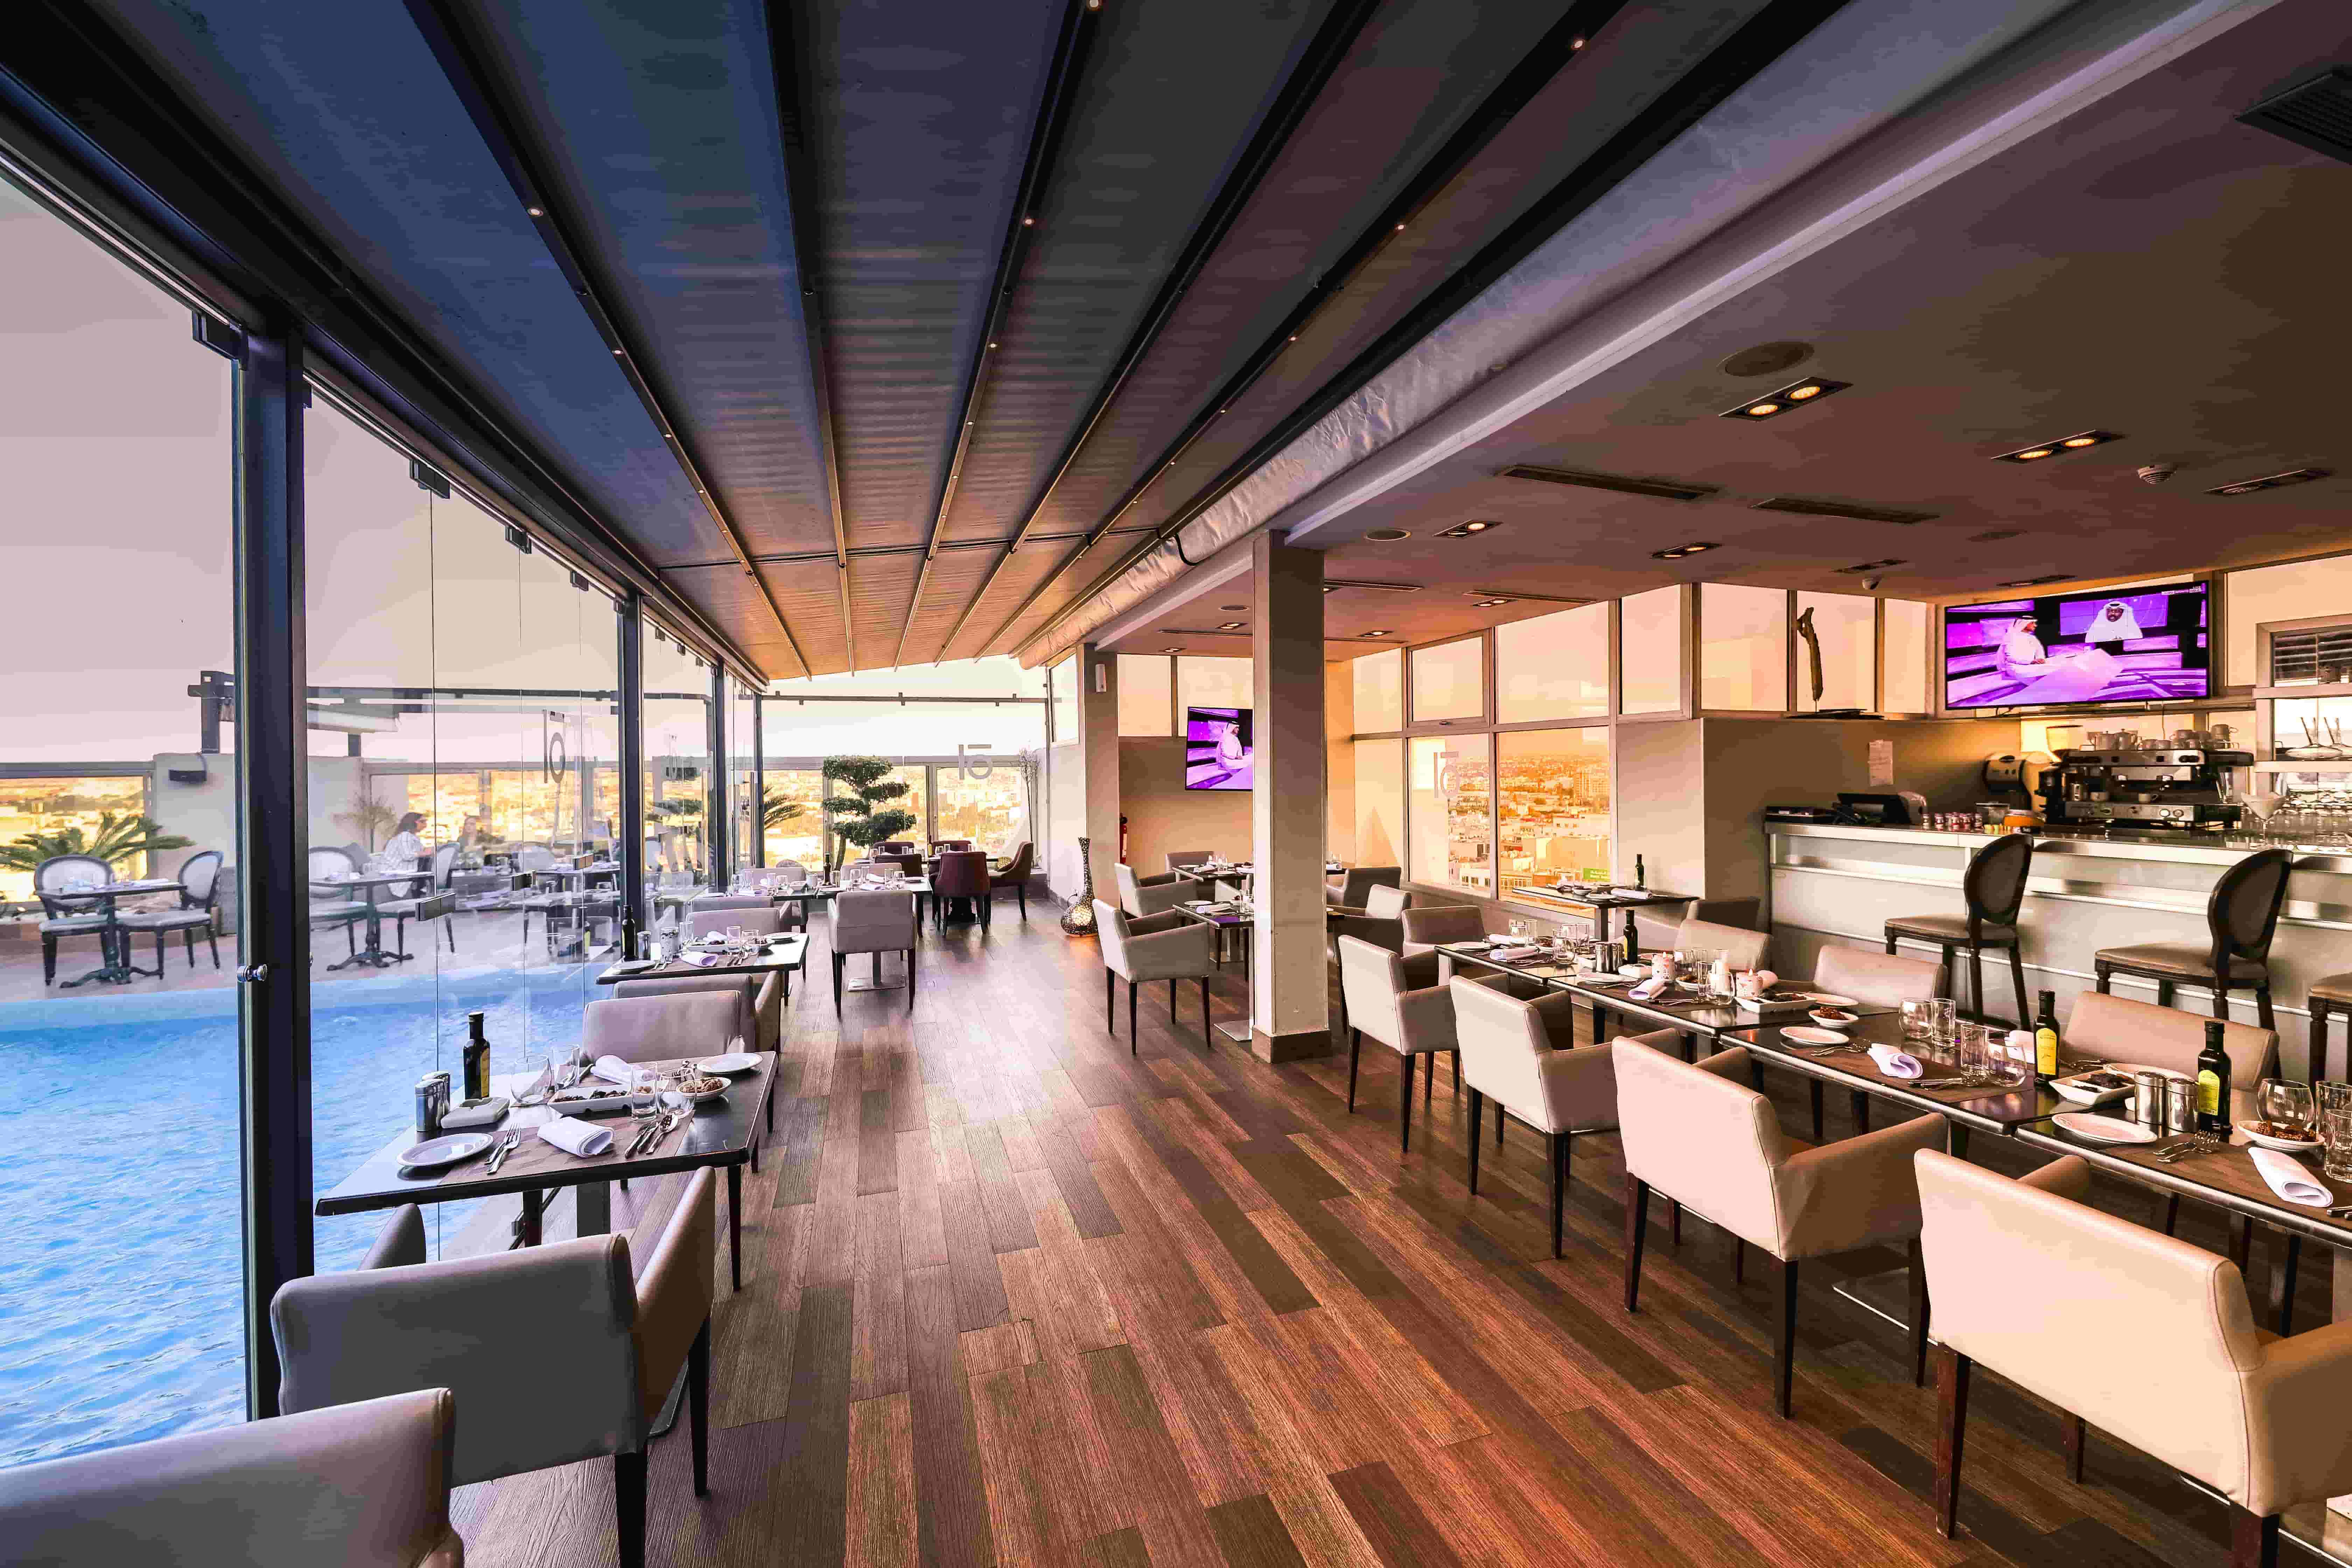 Bristol Restaurants With A View